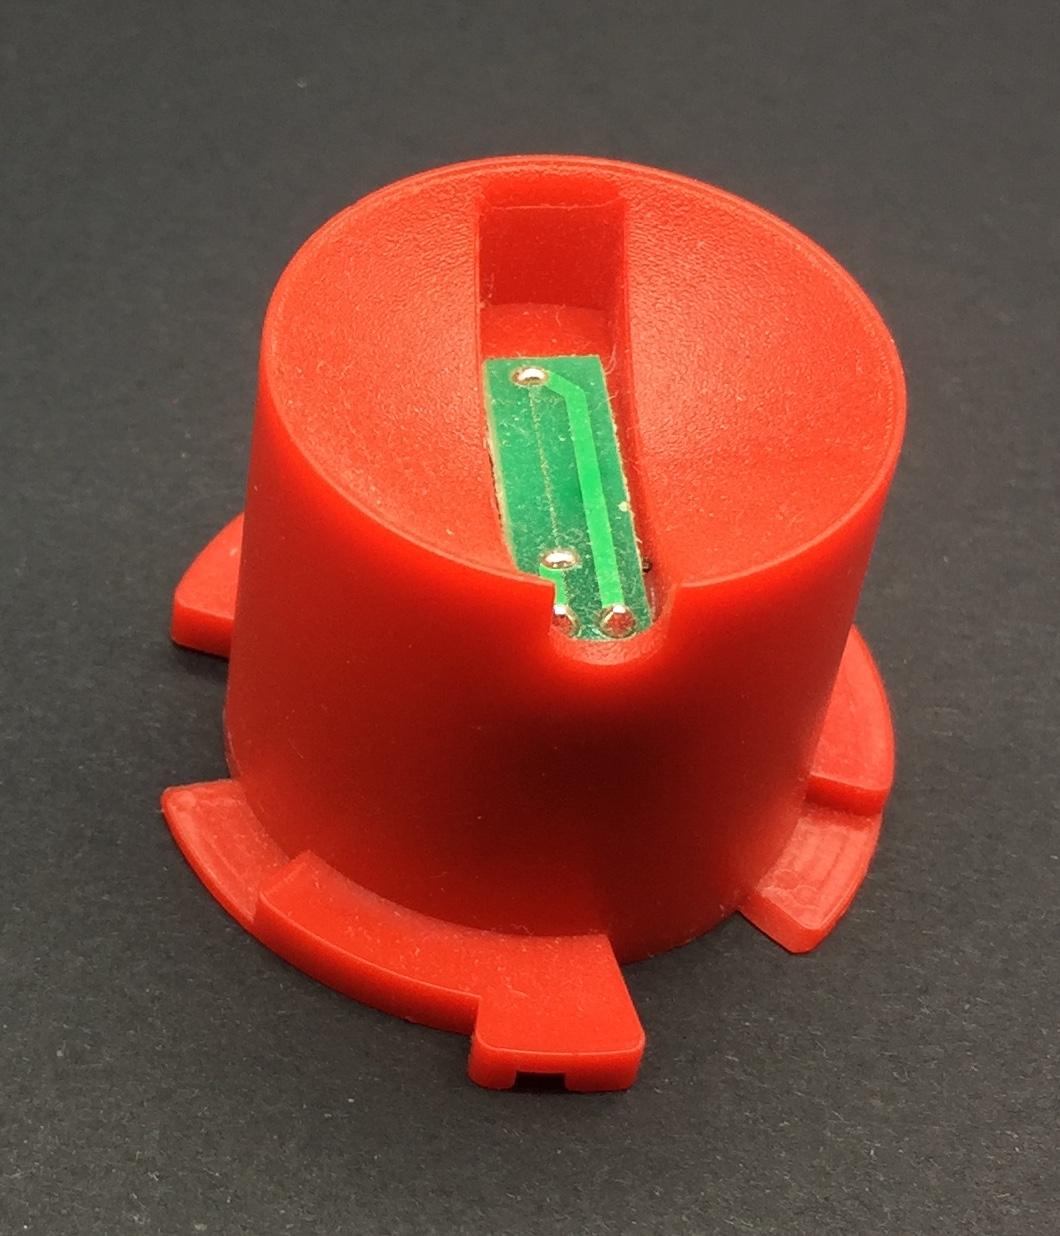 Evolved Pyrotechnics 30mm ABS single shot plug